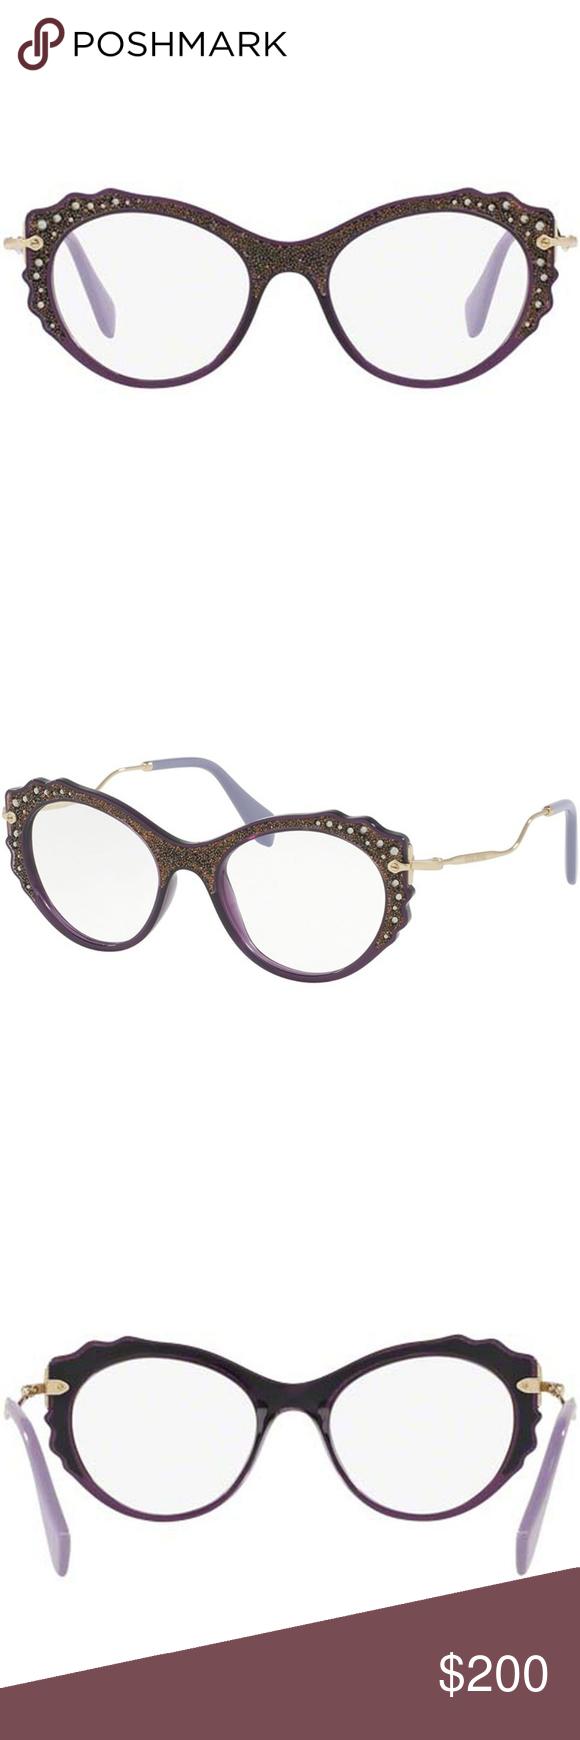 e7e379b7bf5d Miu Miu Cat Eye Crystals Eyeglasses Violet Brand  Miu Miu Model   MU01PV-USV1O1